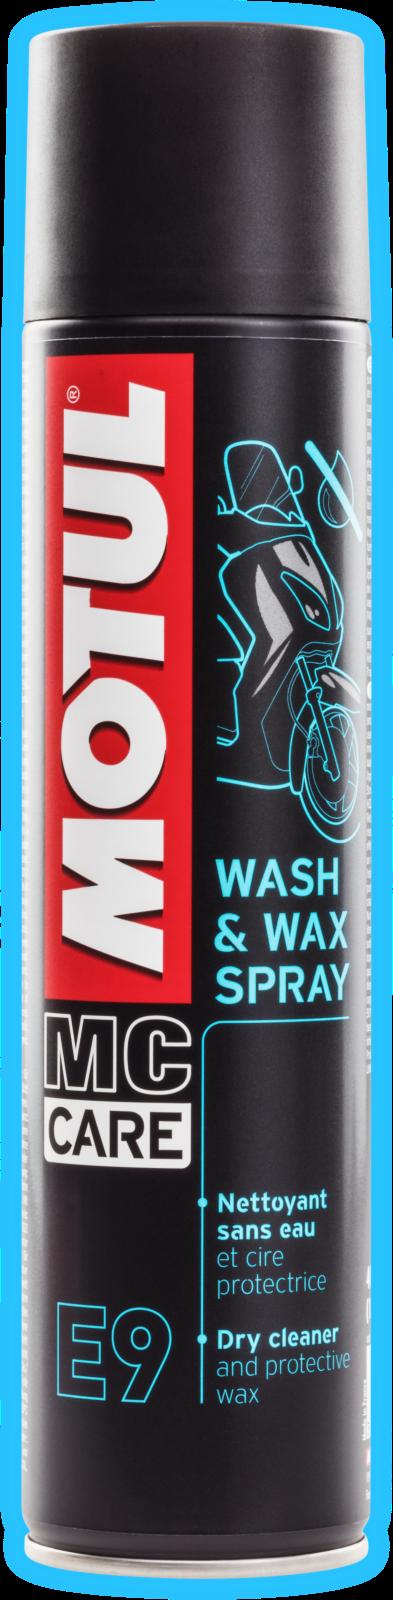 MOTUL AG MOTUL E1 Wash & Wax 0,4L